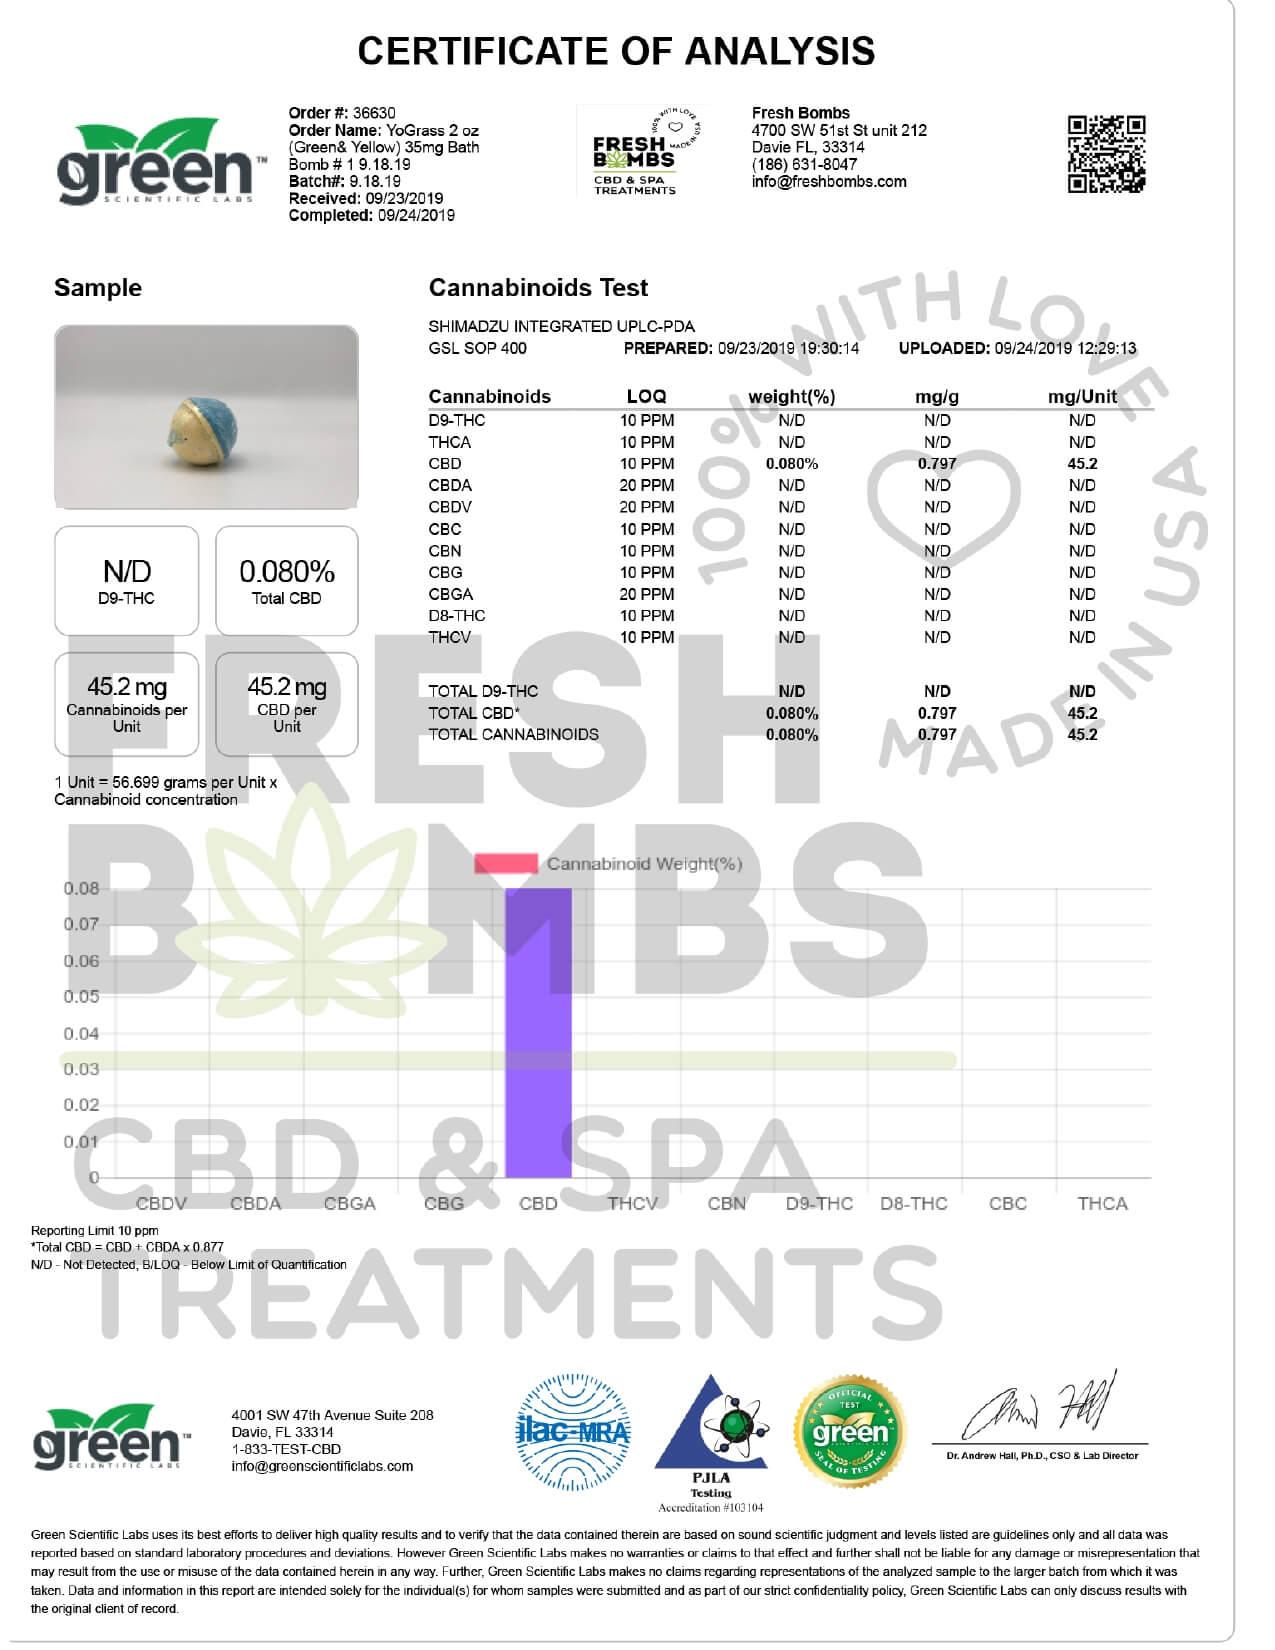 Fresh Bombs CBD Bath YoGrass Bath Bomb 2oz 35mg Lab Report